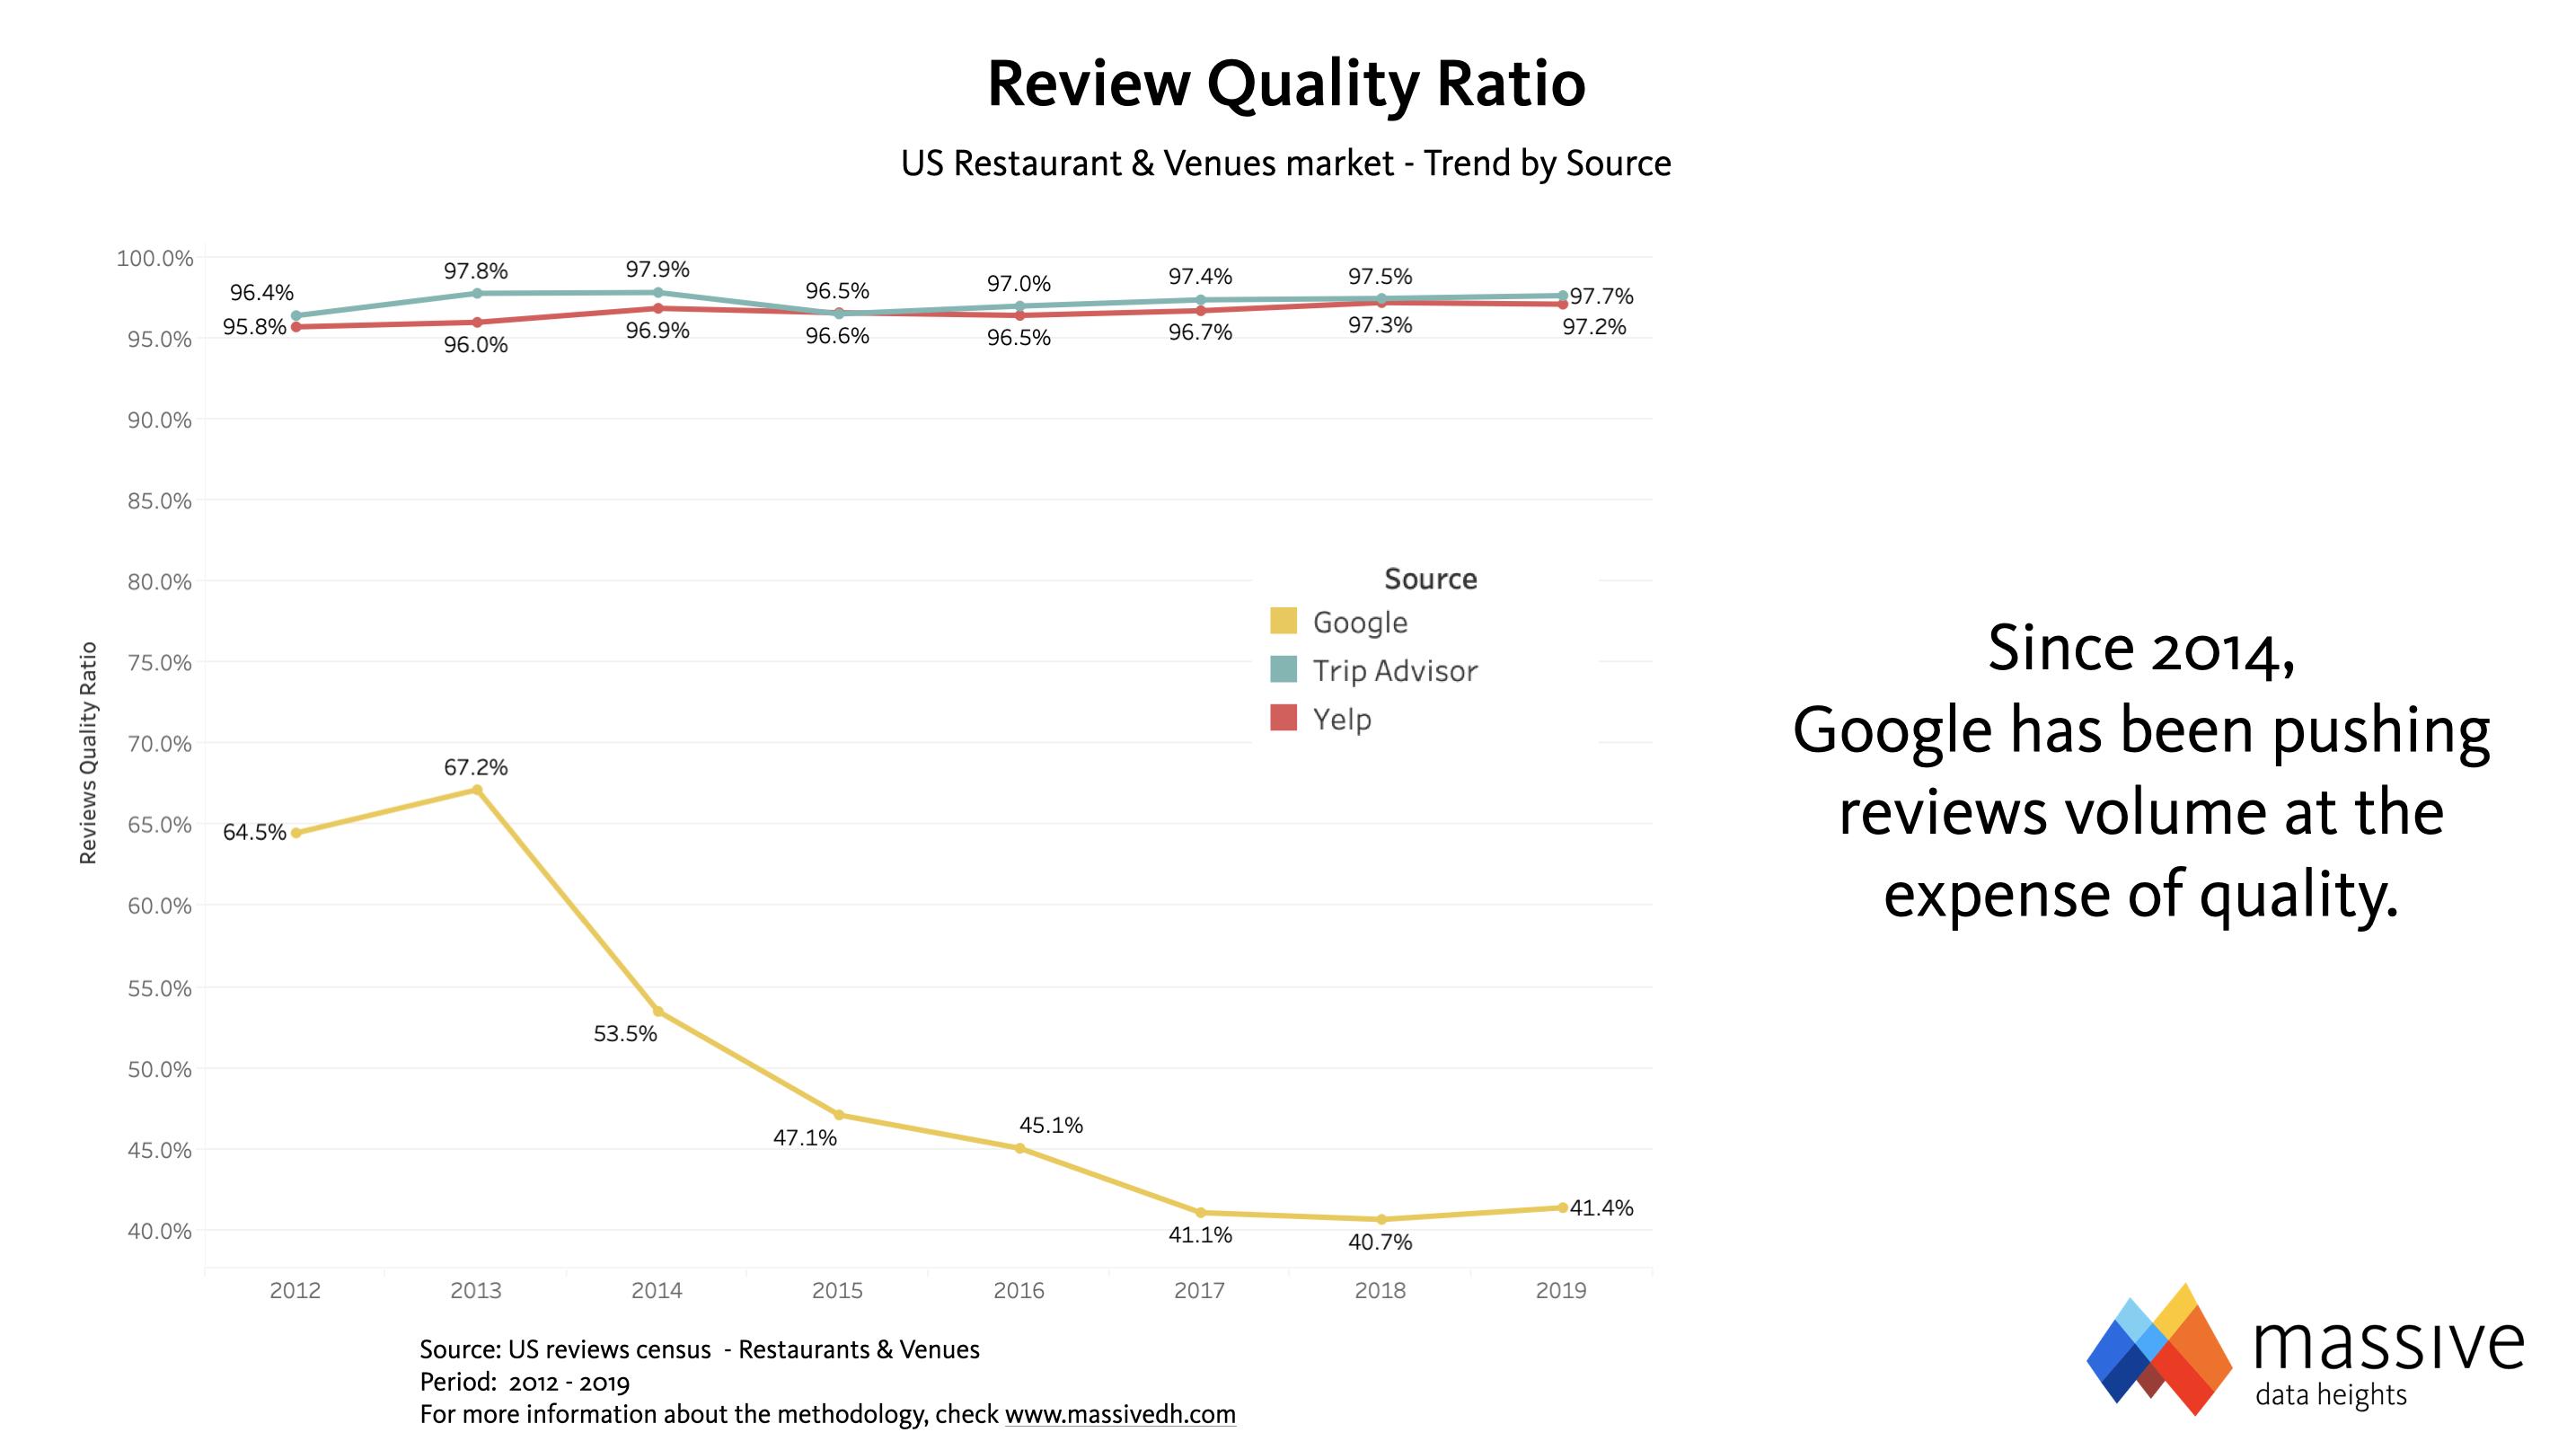 MASSIVE - Google's Review Quality Ratio